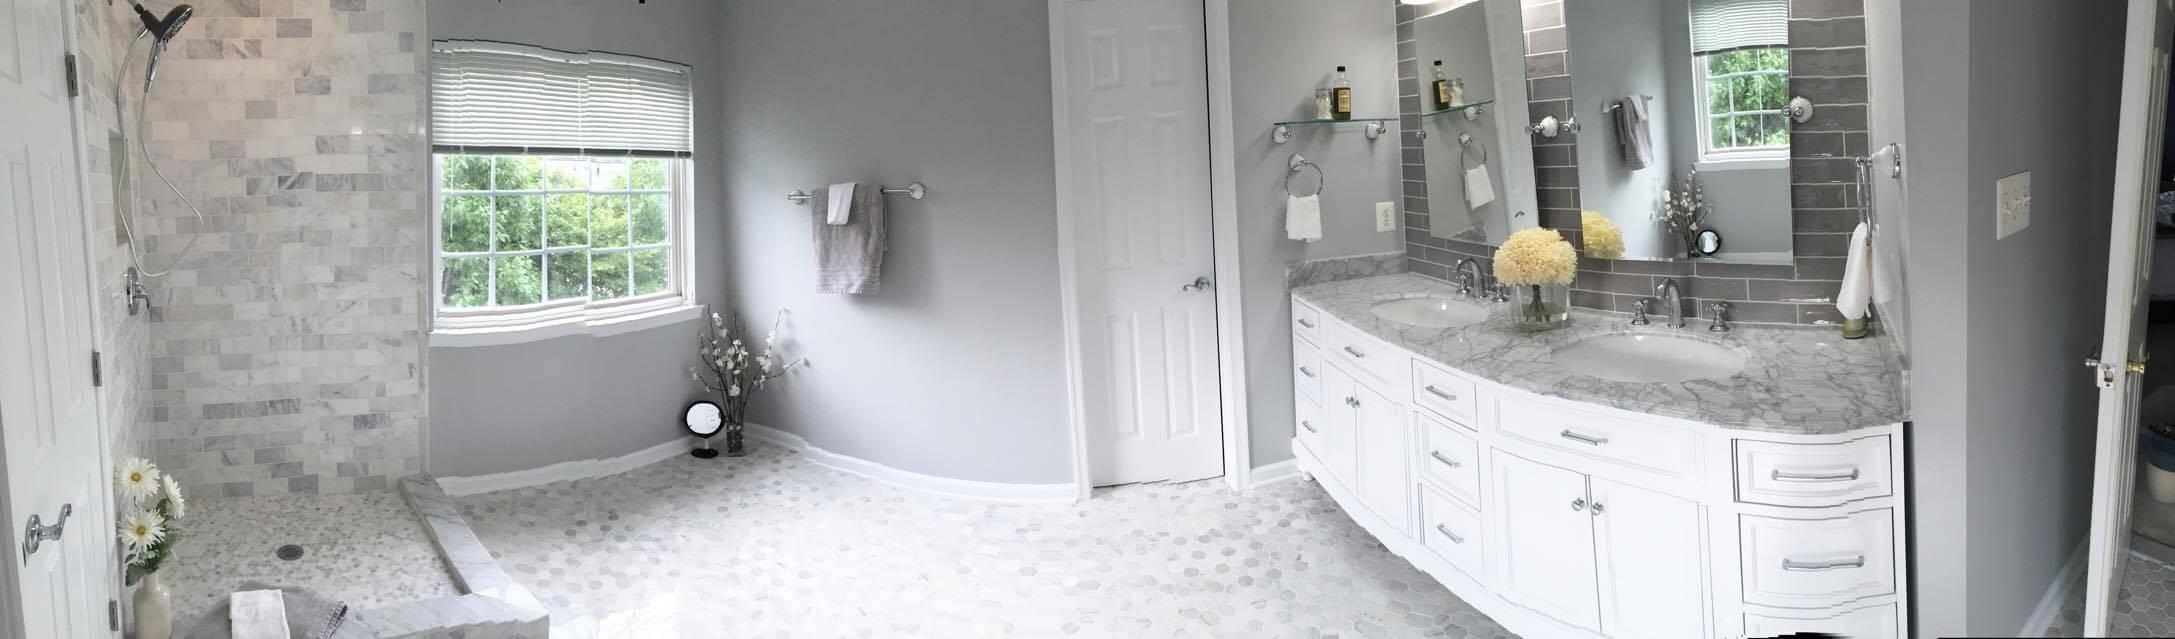 Custom bathroom remodel bristow va building by design for Custom bathroom renovations